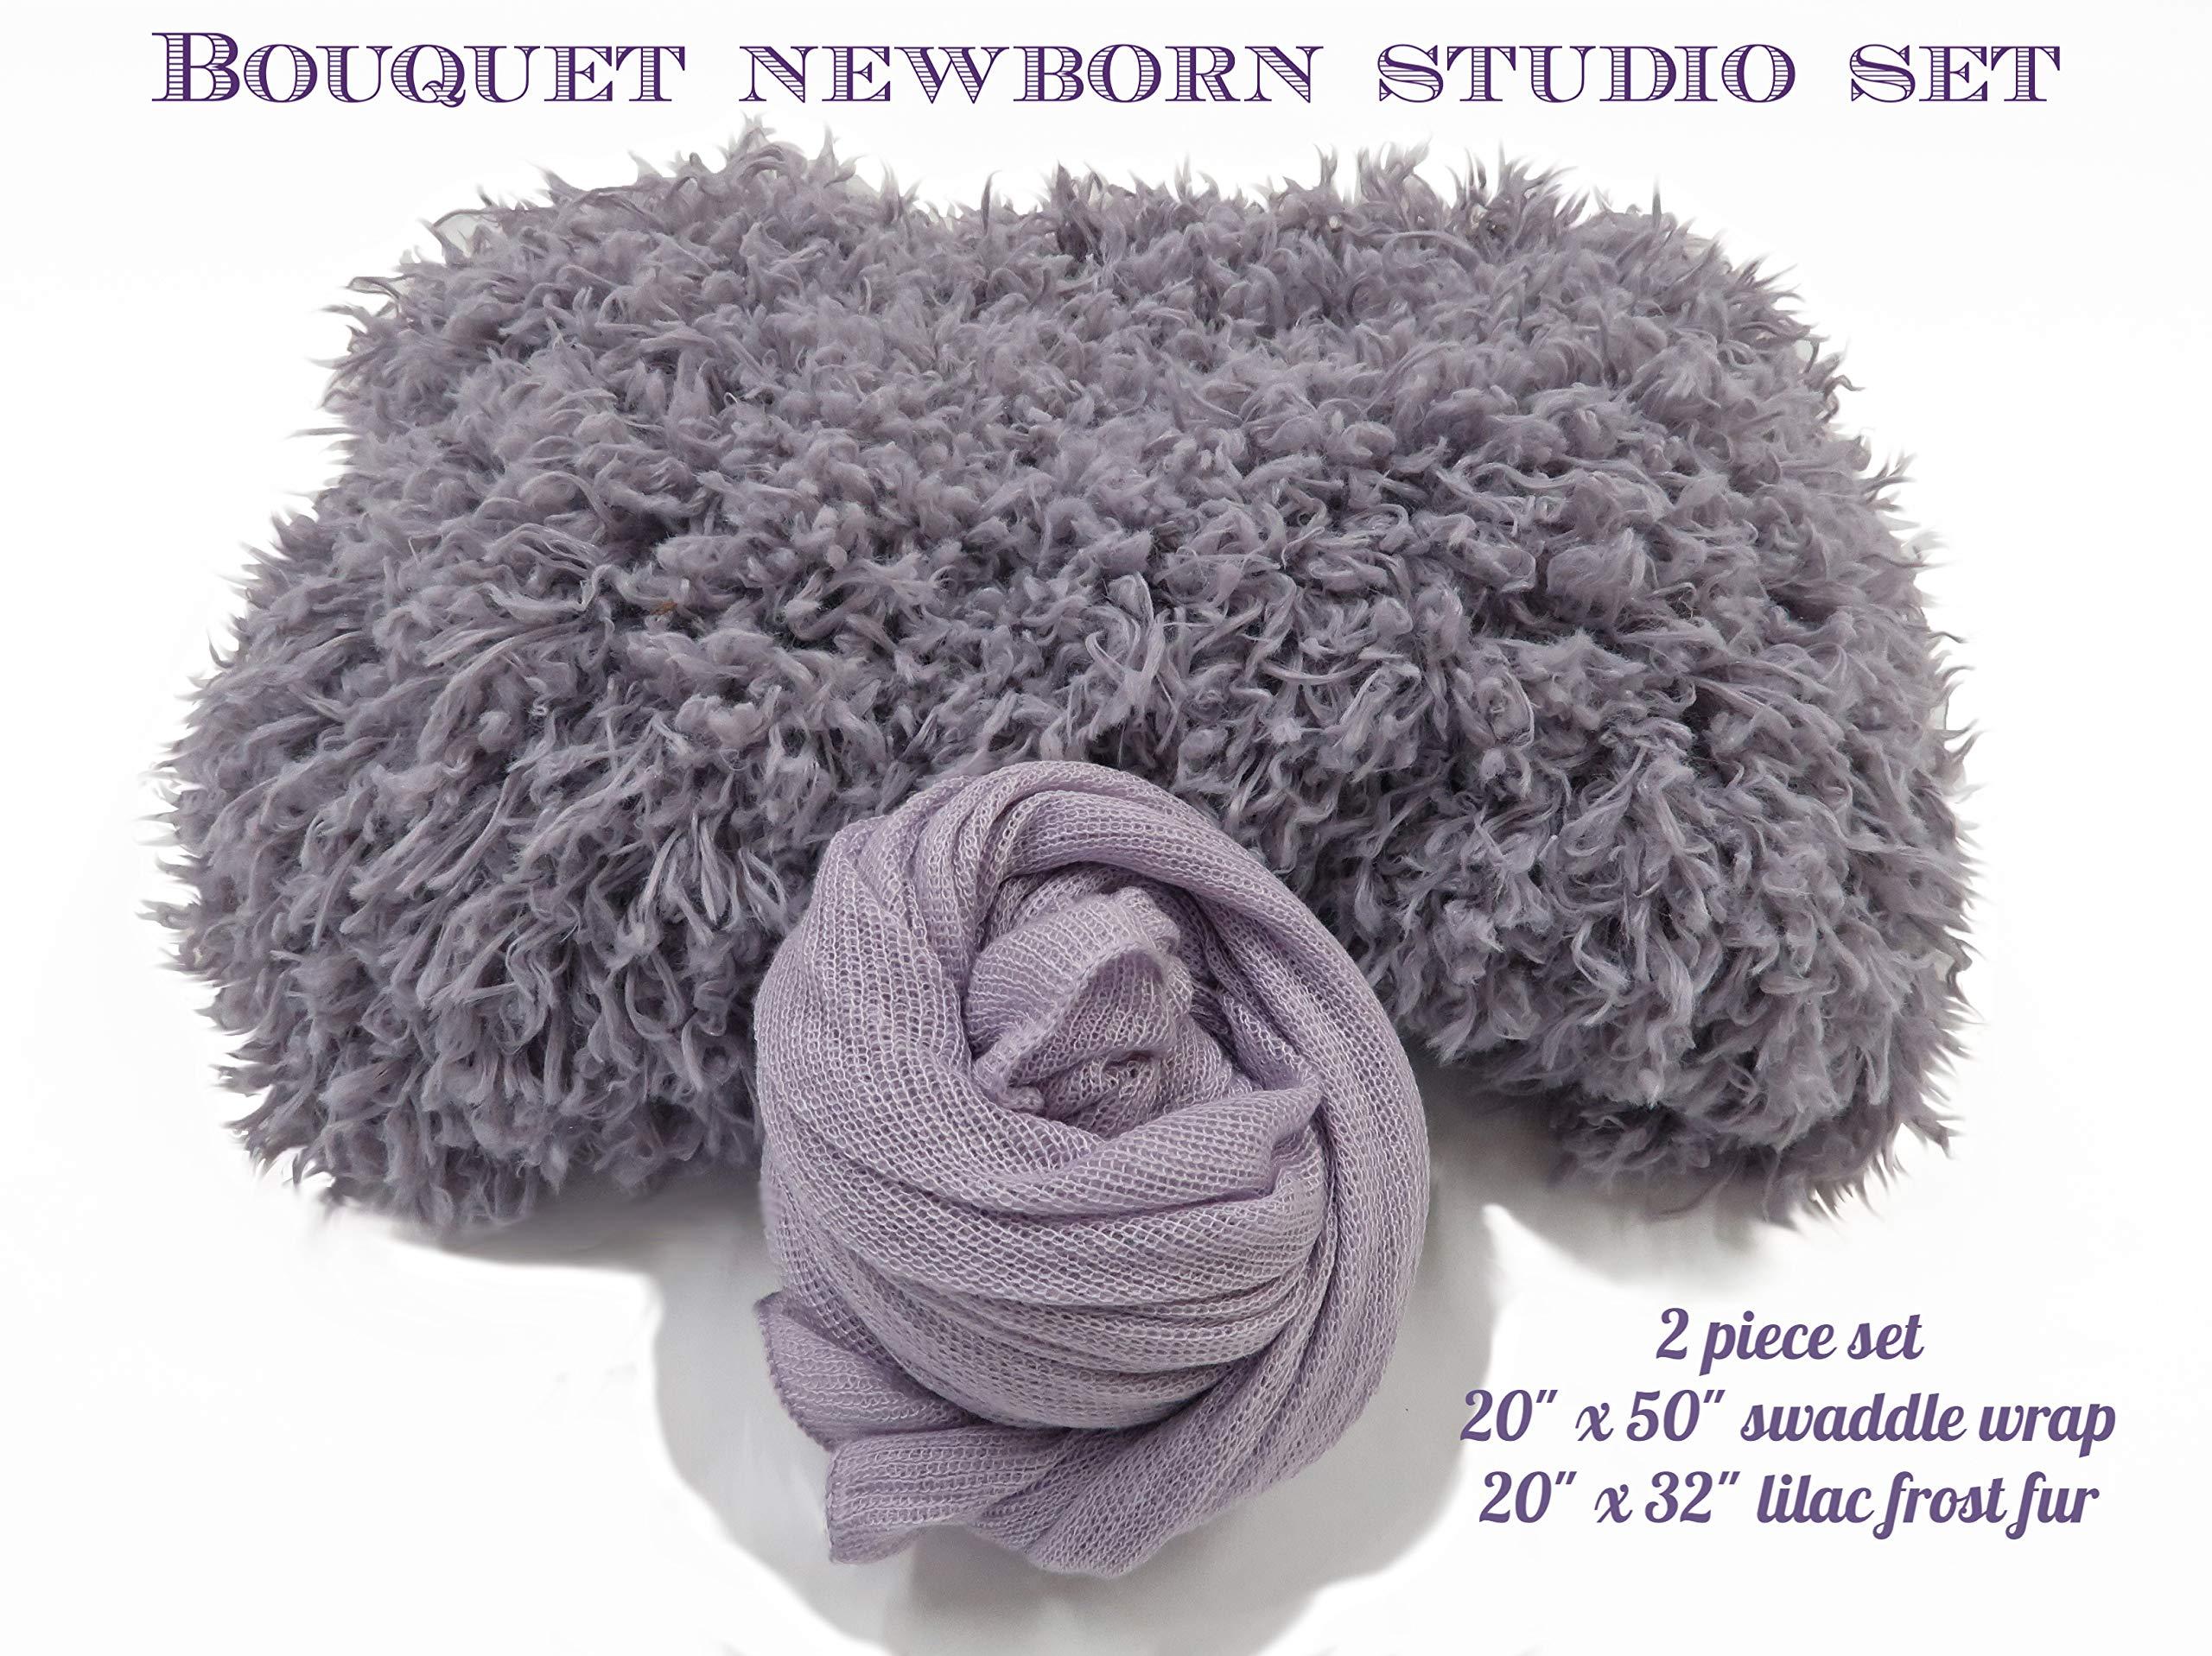 Custom Photo Props, Professional Newborn Photography, Bouquet Studio 2 Piece Set